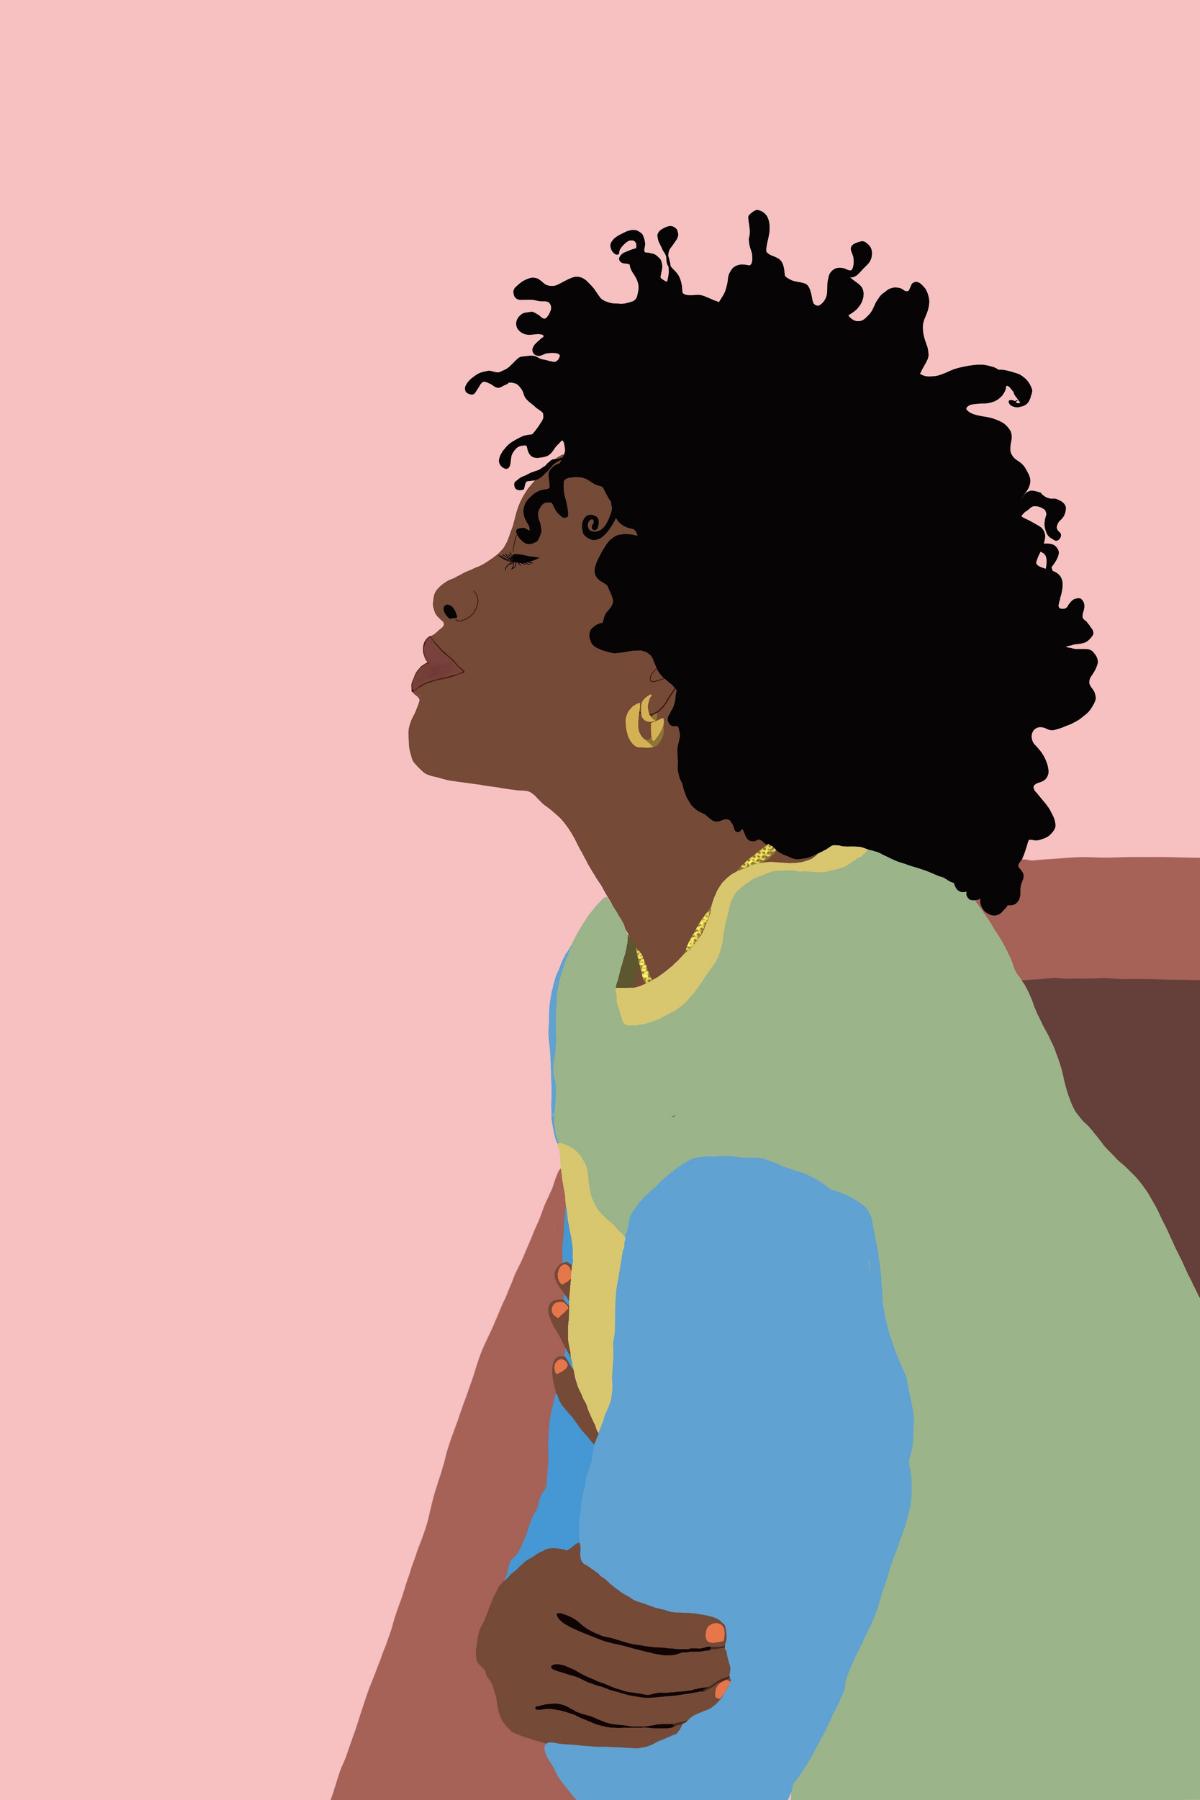 LWM Prints + Goods on Etsy #blackart #blackwomen #lewellnessmere #blackwomen #blacklove #flatillustration #fallillustration #womanillustration #blackillustrators #naturalhair #curls #pinkartwork